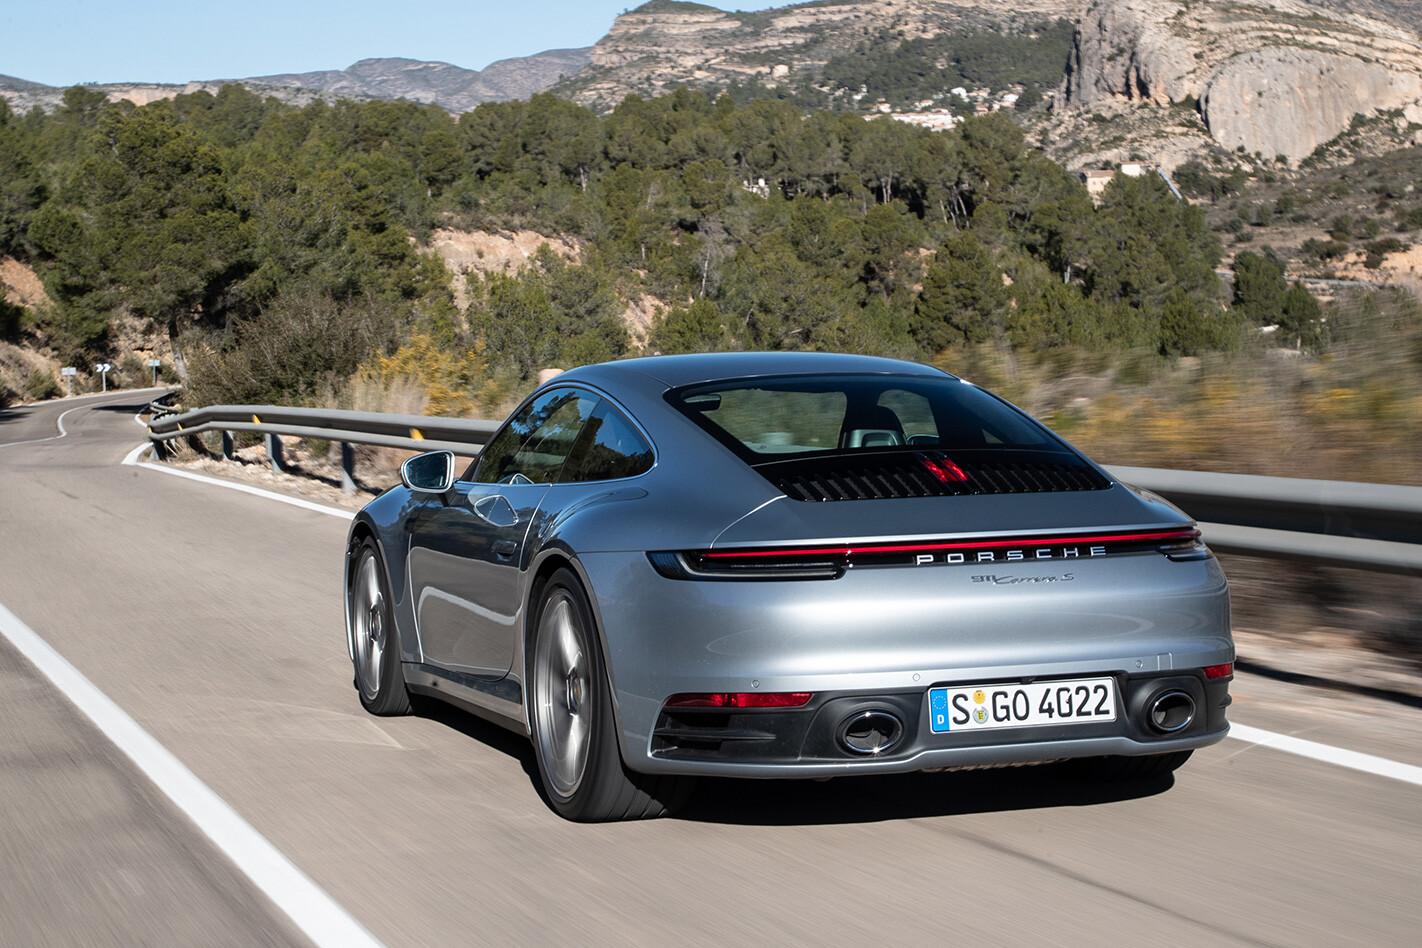 Porsche 911 Carrera S Bumper Jpg